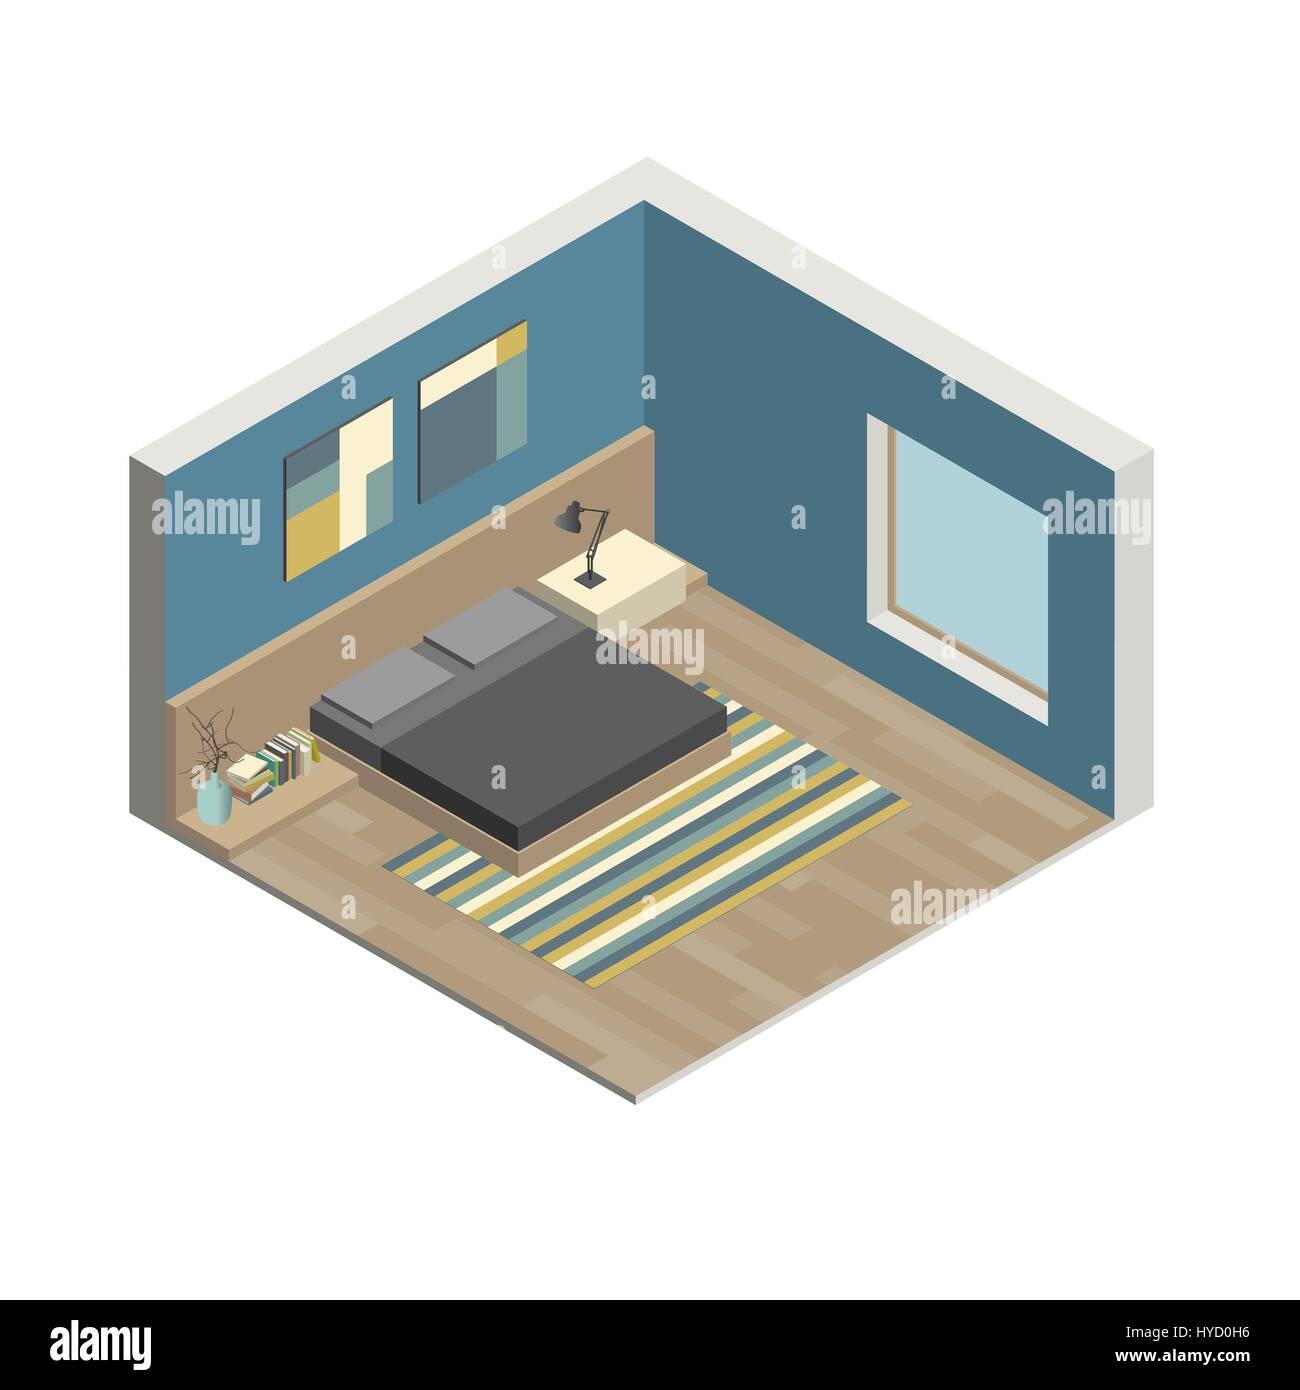 3d Floor Plan Isometric: Illustration Of The Interior Of Bedroom. Isometric View